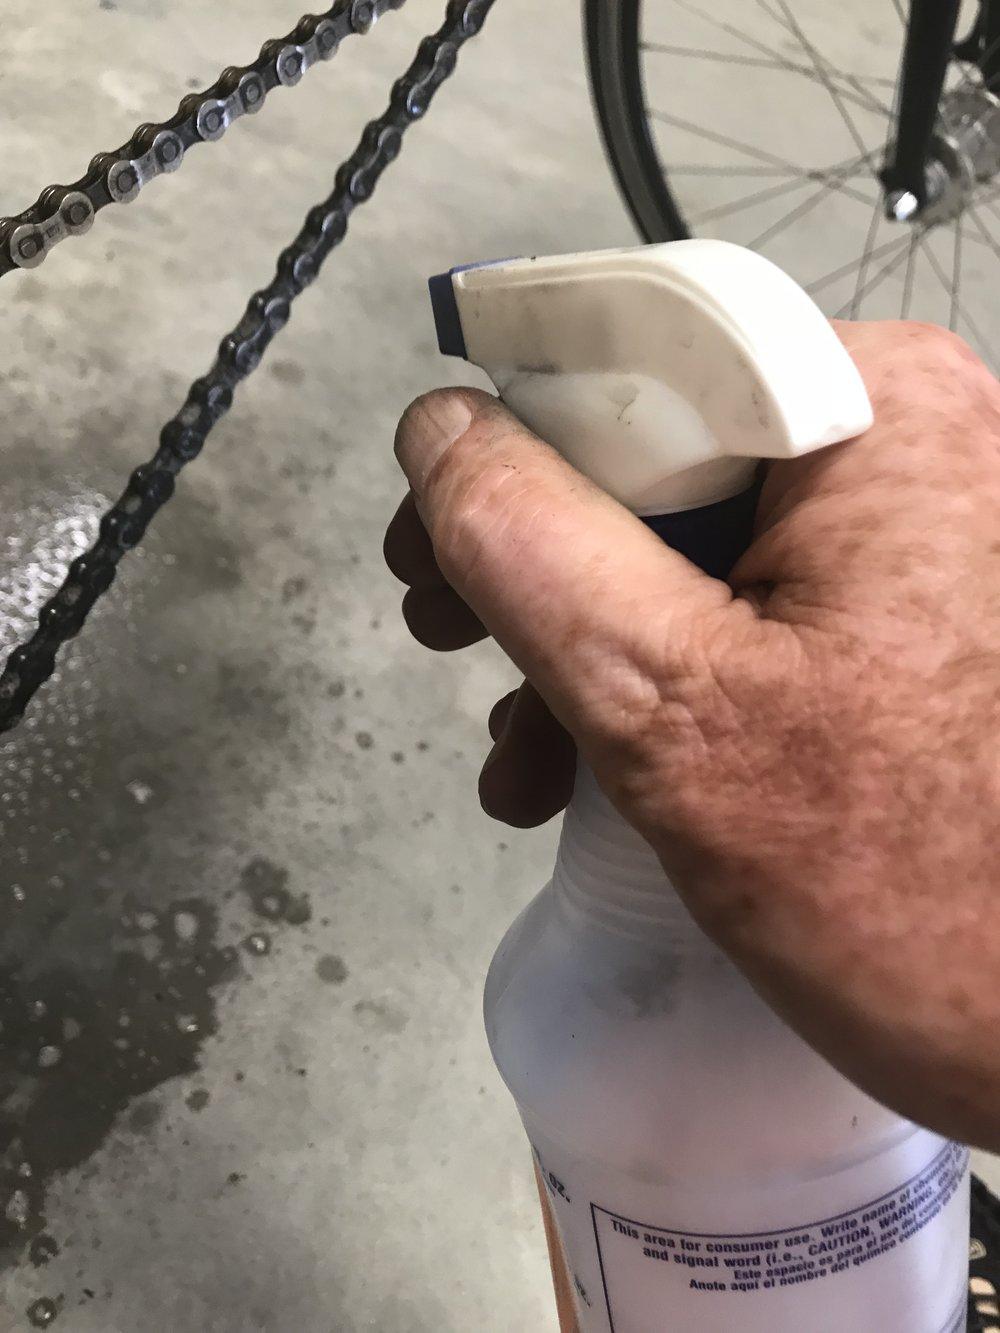 Spray the chain